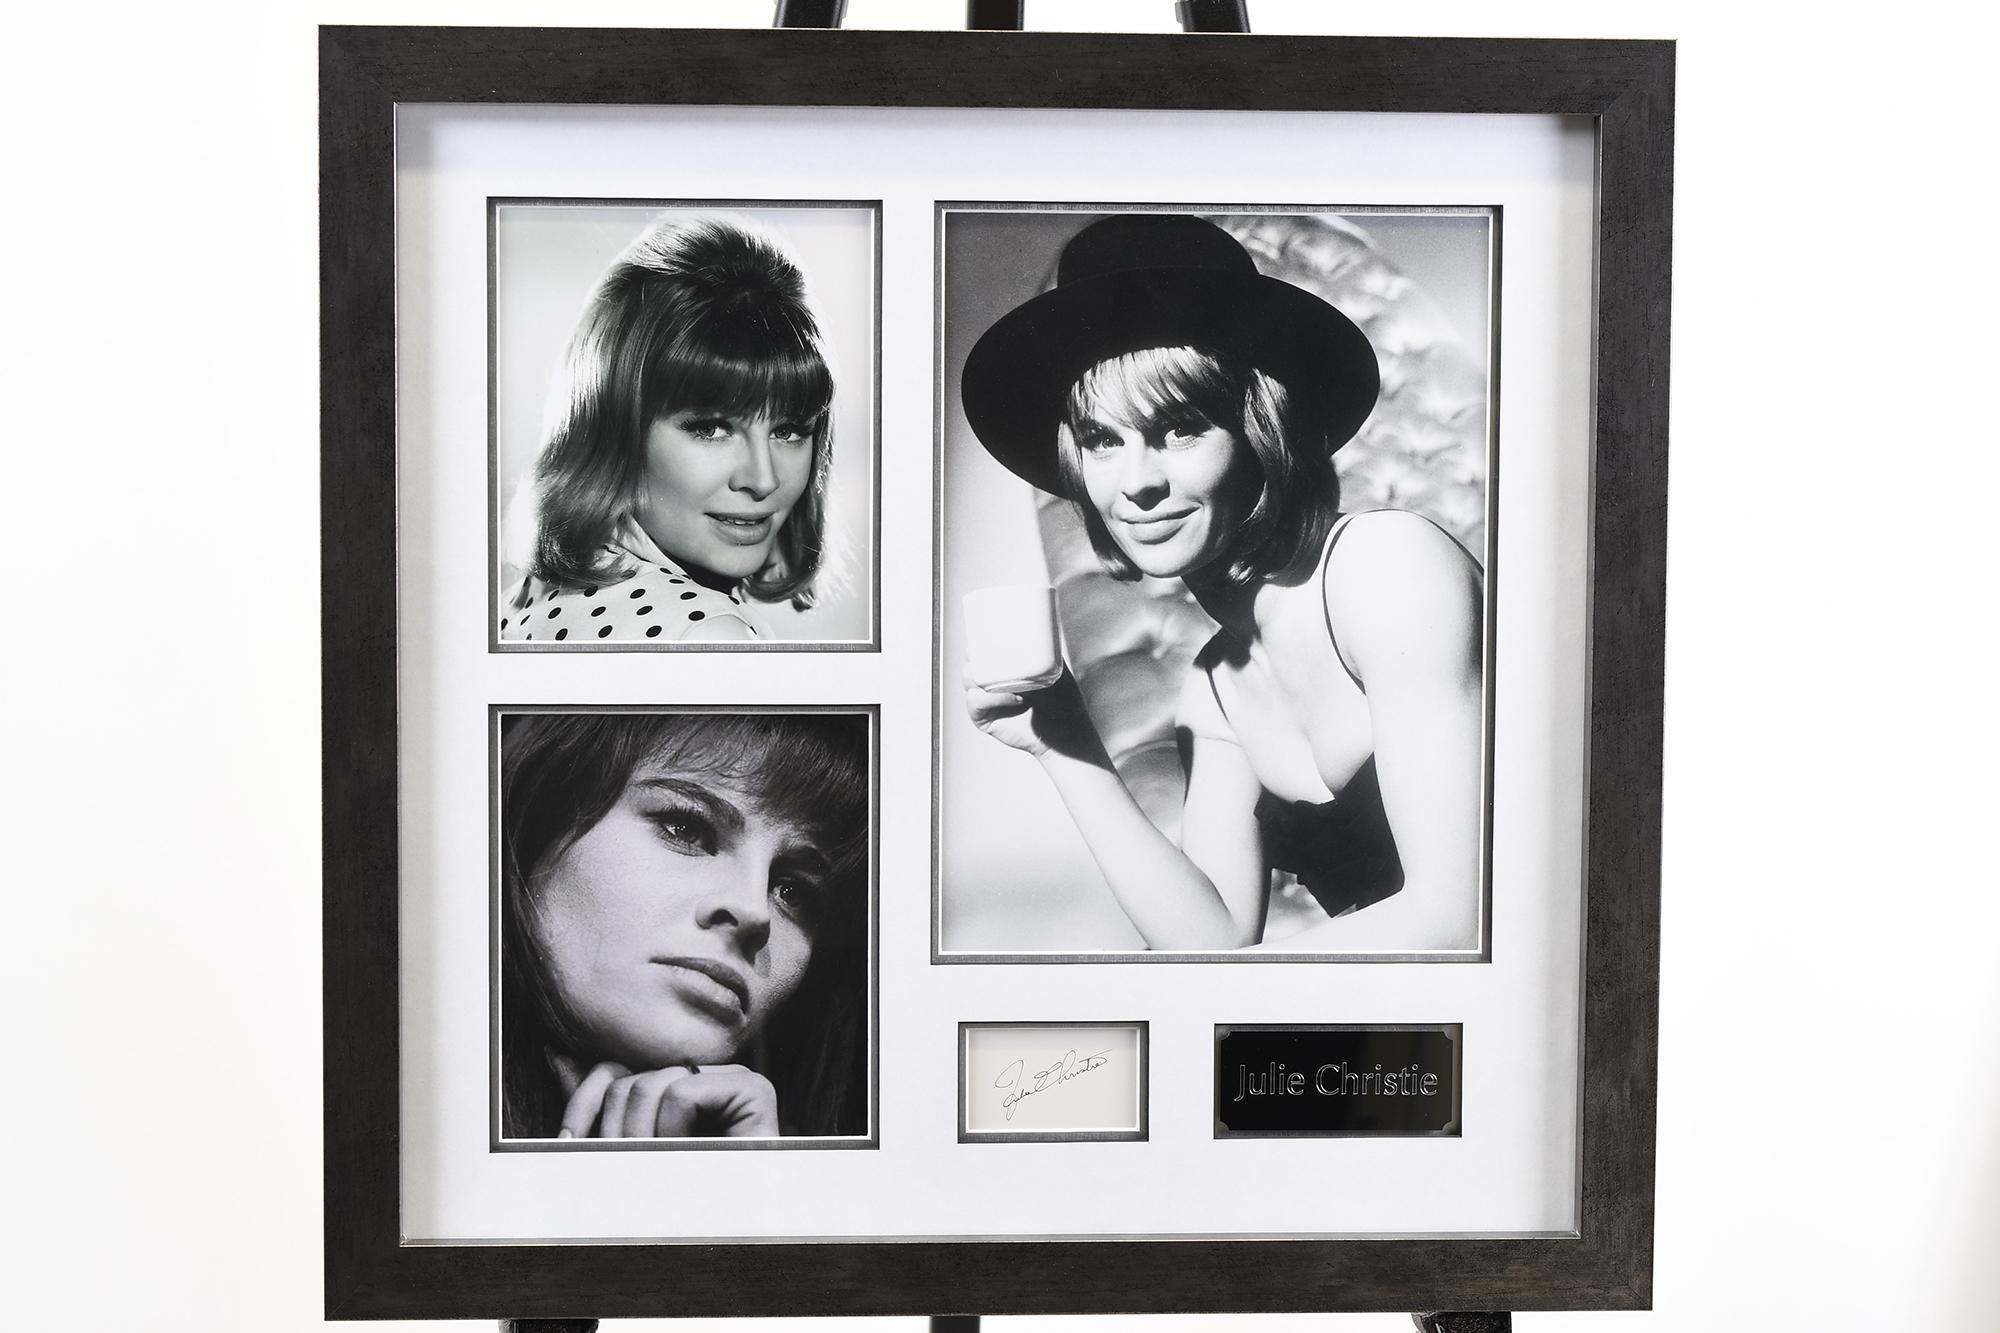 Julie Christie Memorabilia Framed Presentation